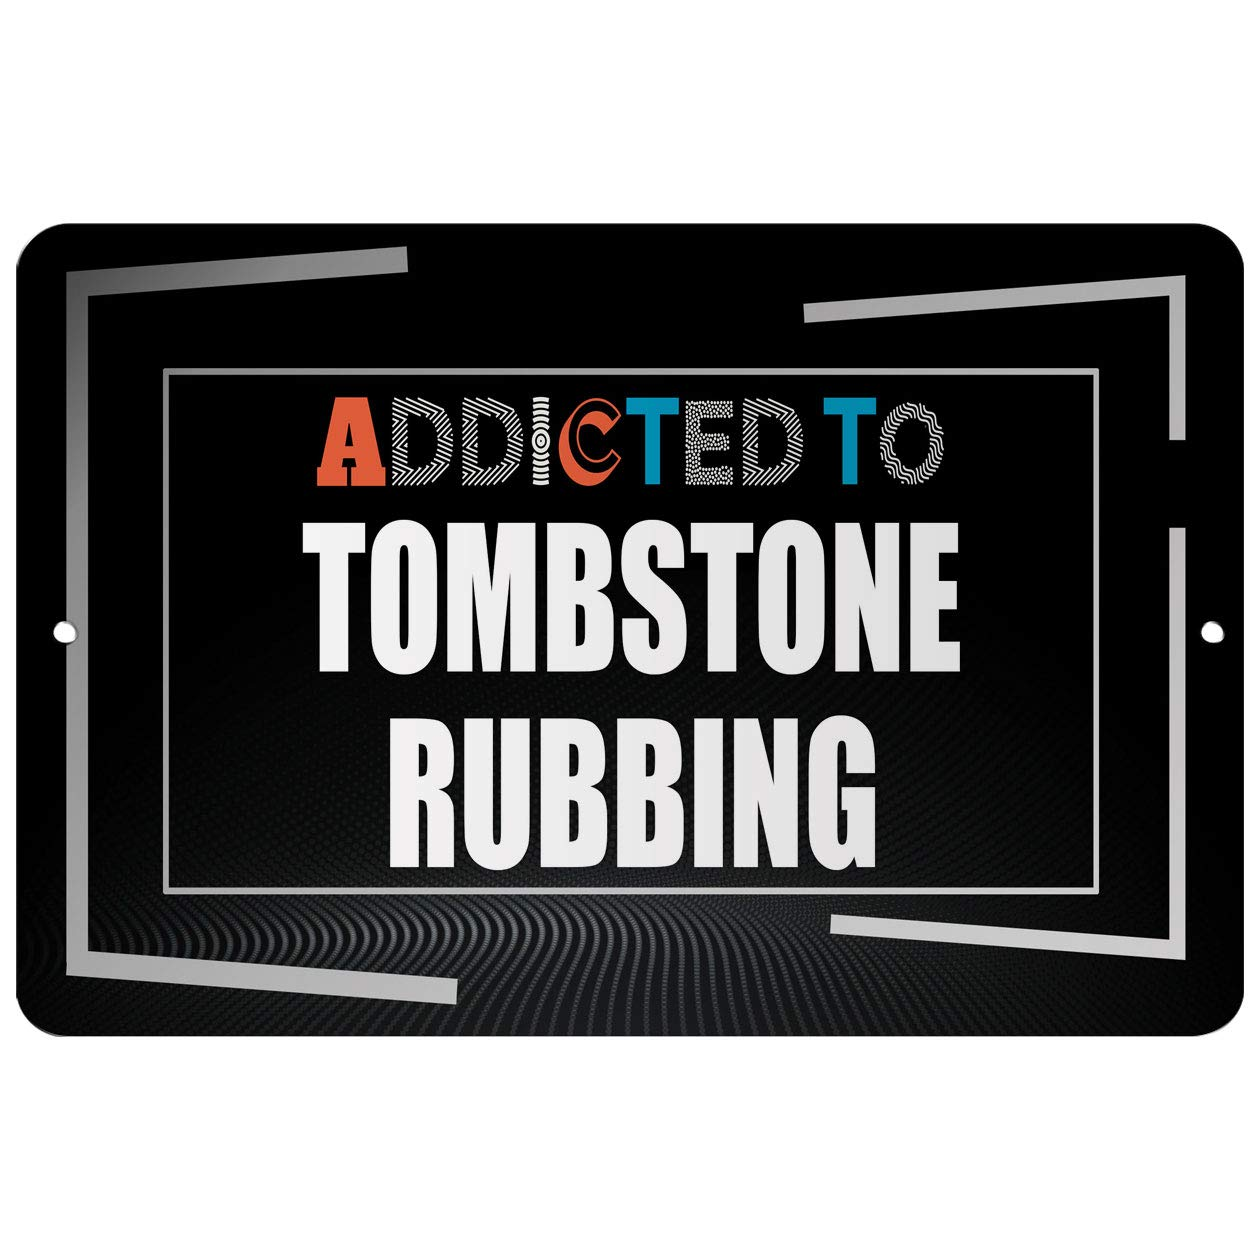 Makoroni - Addicted to Tombstone RUBBING Hobby - Street Sign 12''x18'' Aluminum by Makoroni